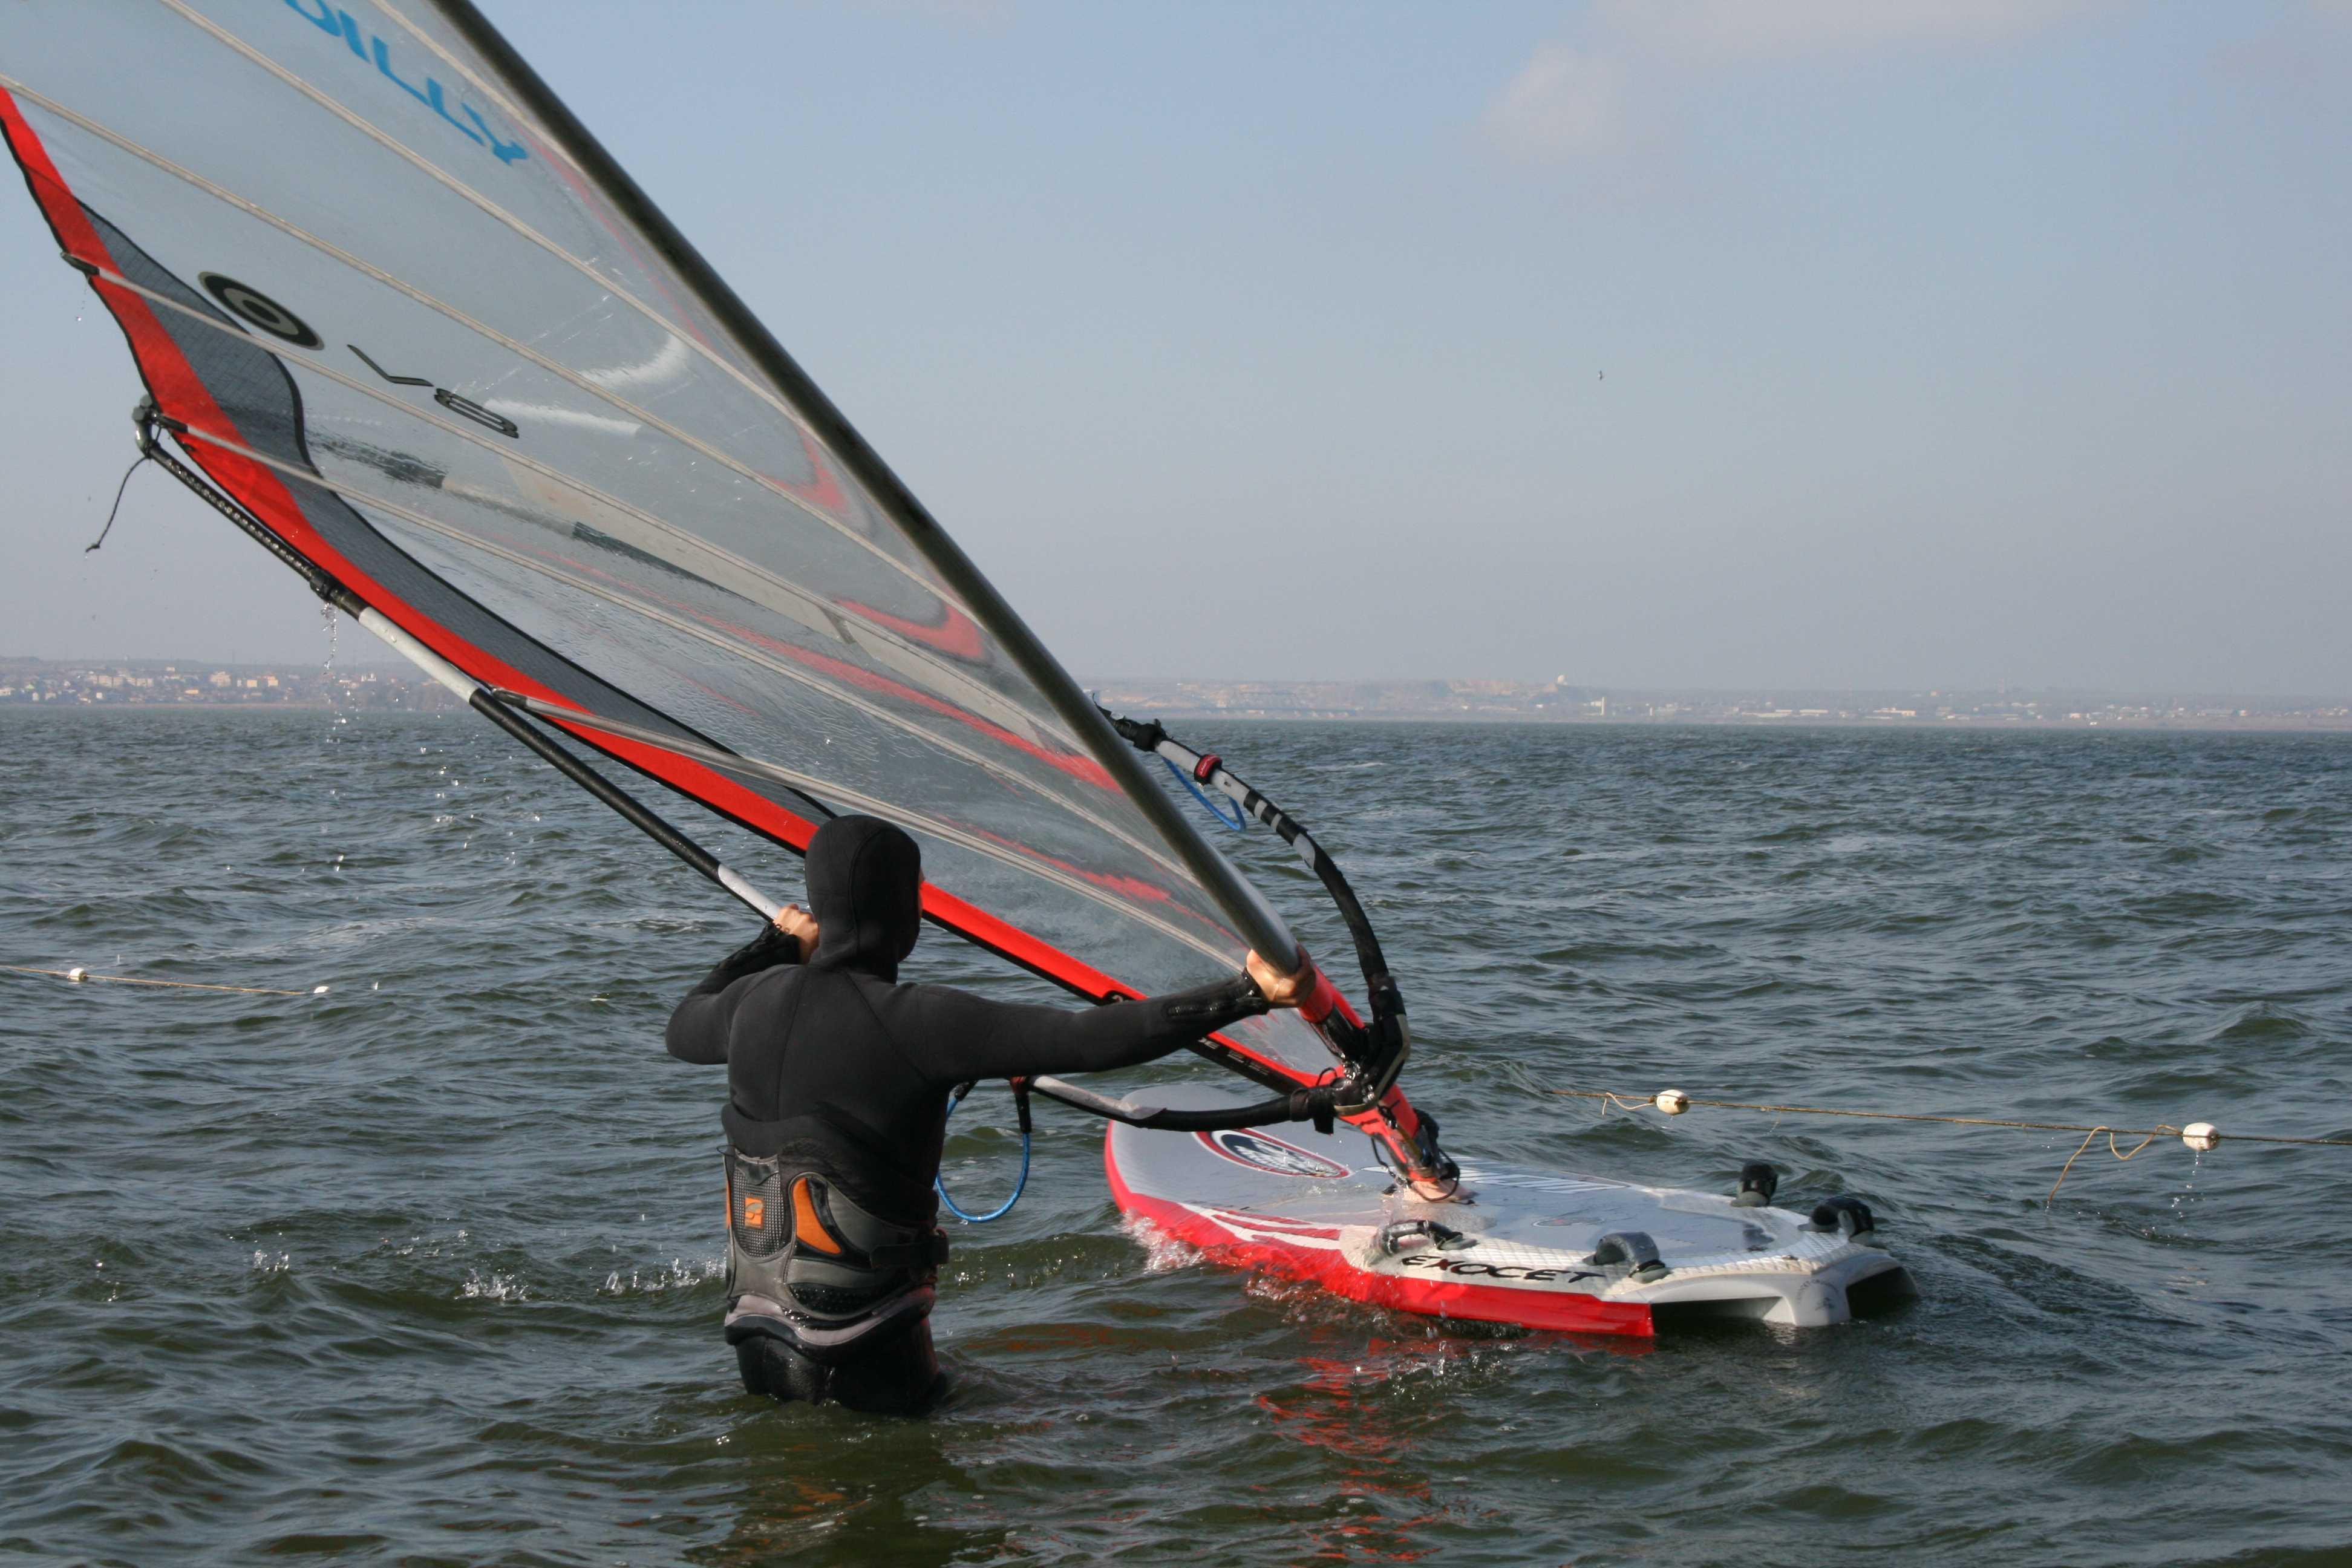 windsurfing-mamaia-30-11-2009-6